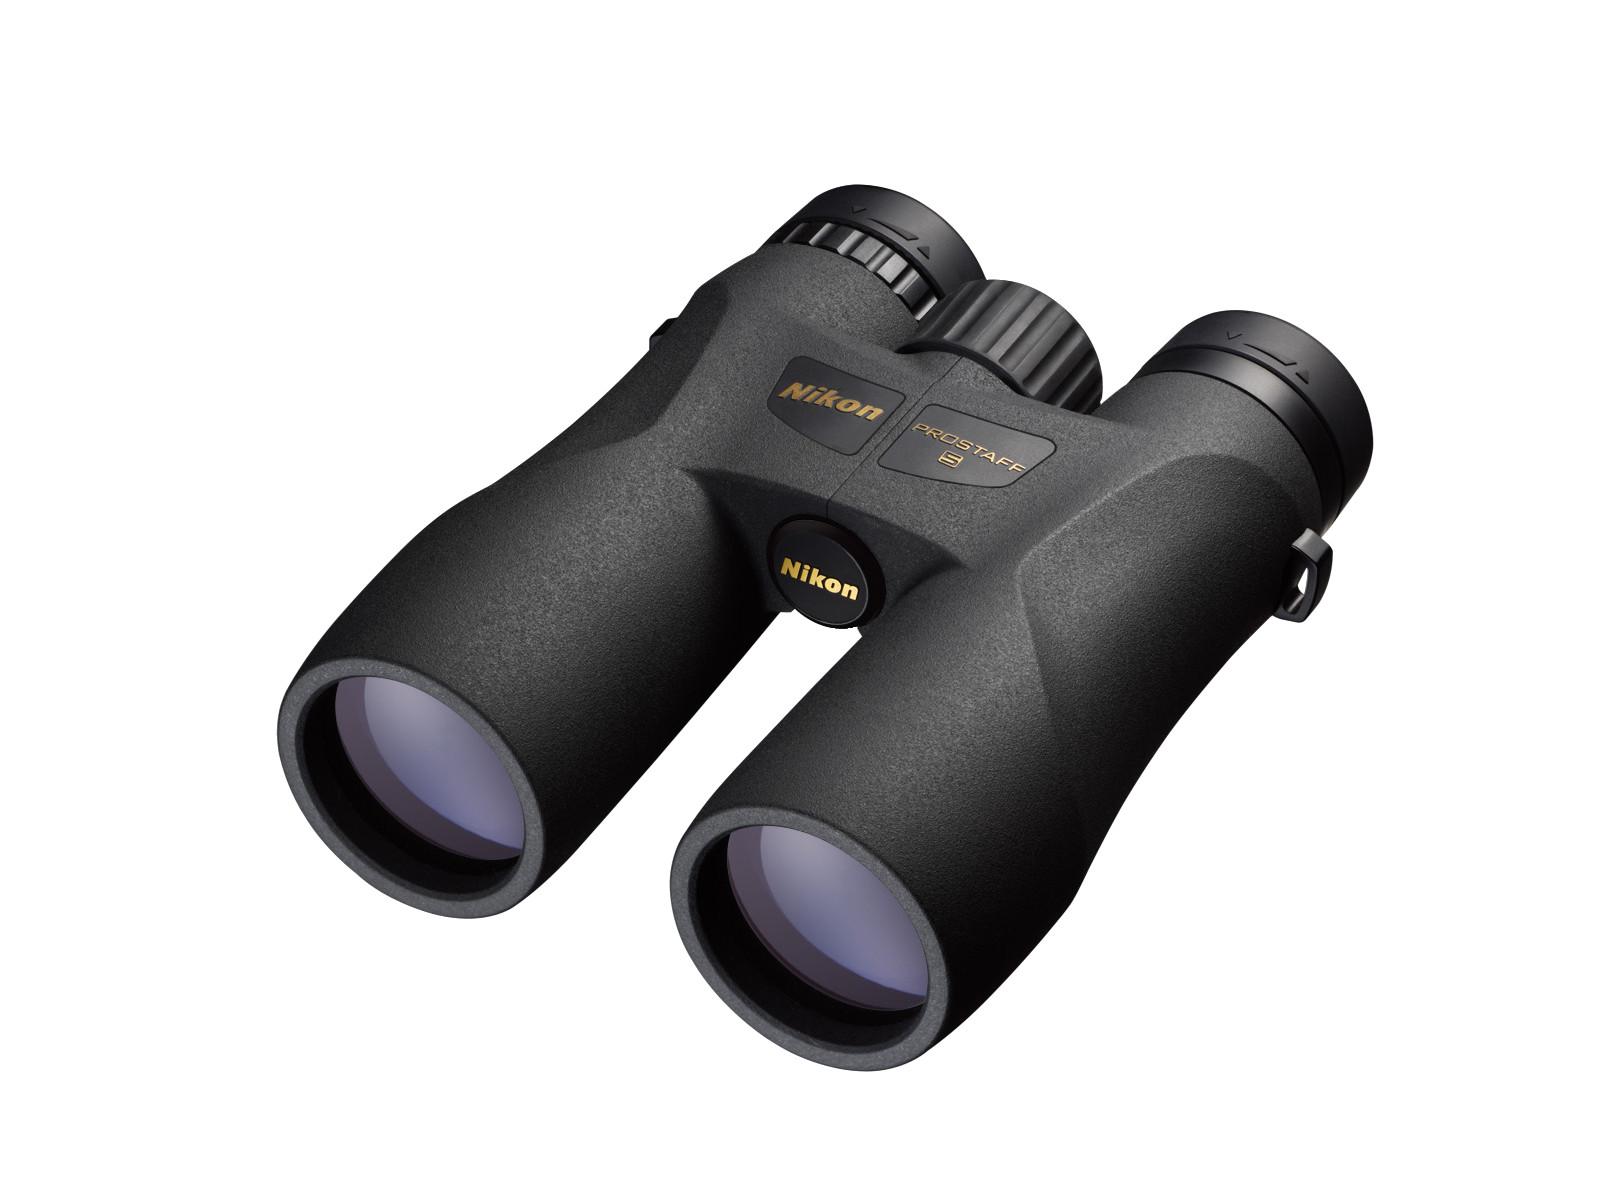 Prostaff 5 8X42 雙筒望遠鏡